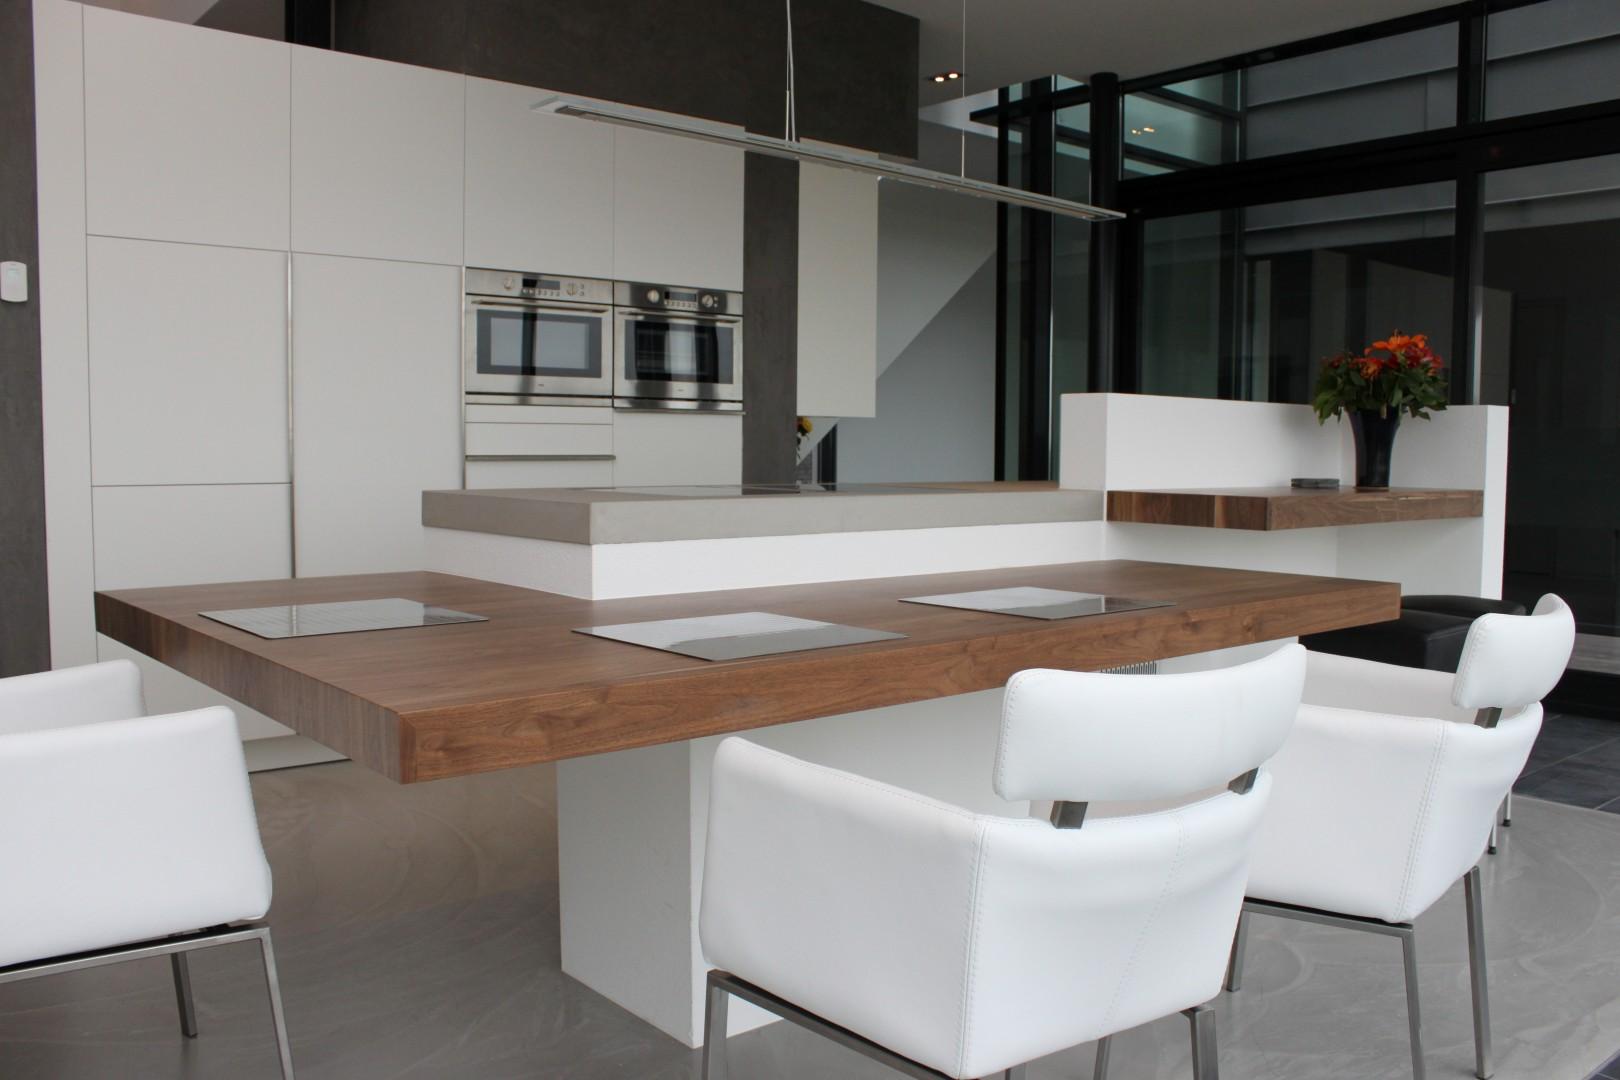 Maatwerk keuken hout | Beton | Corian by JP Walker